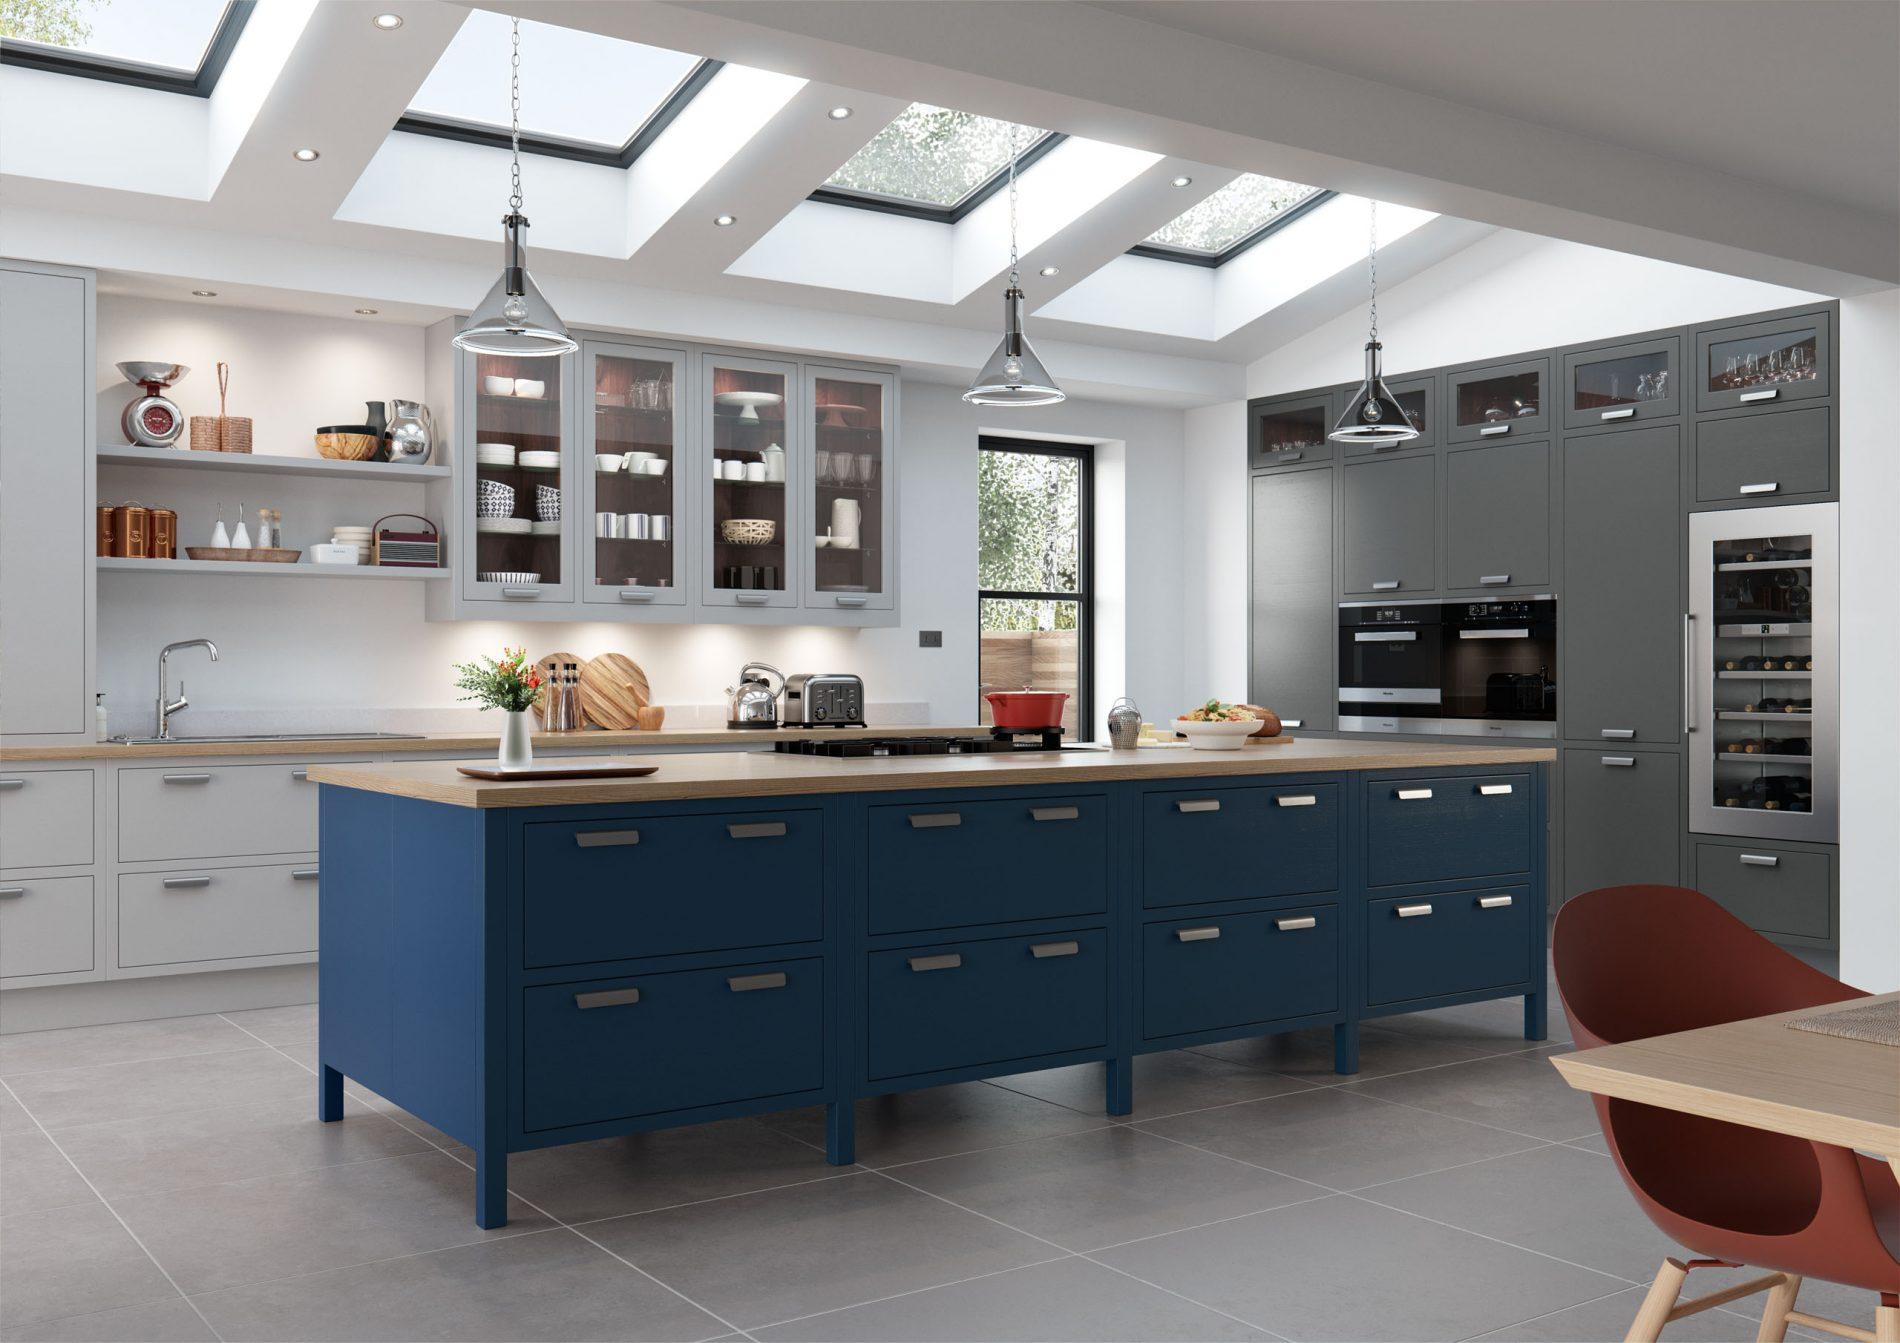 Luscombe kitchen Crestwood of Lymington